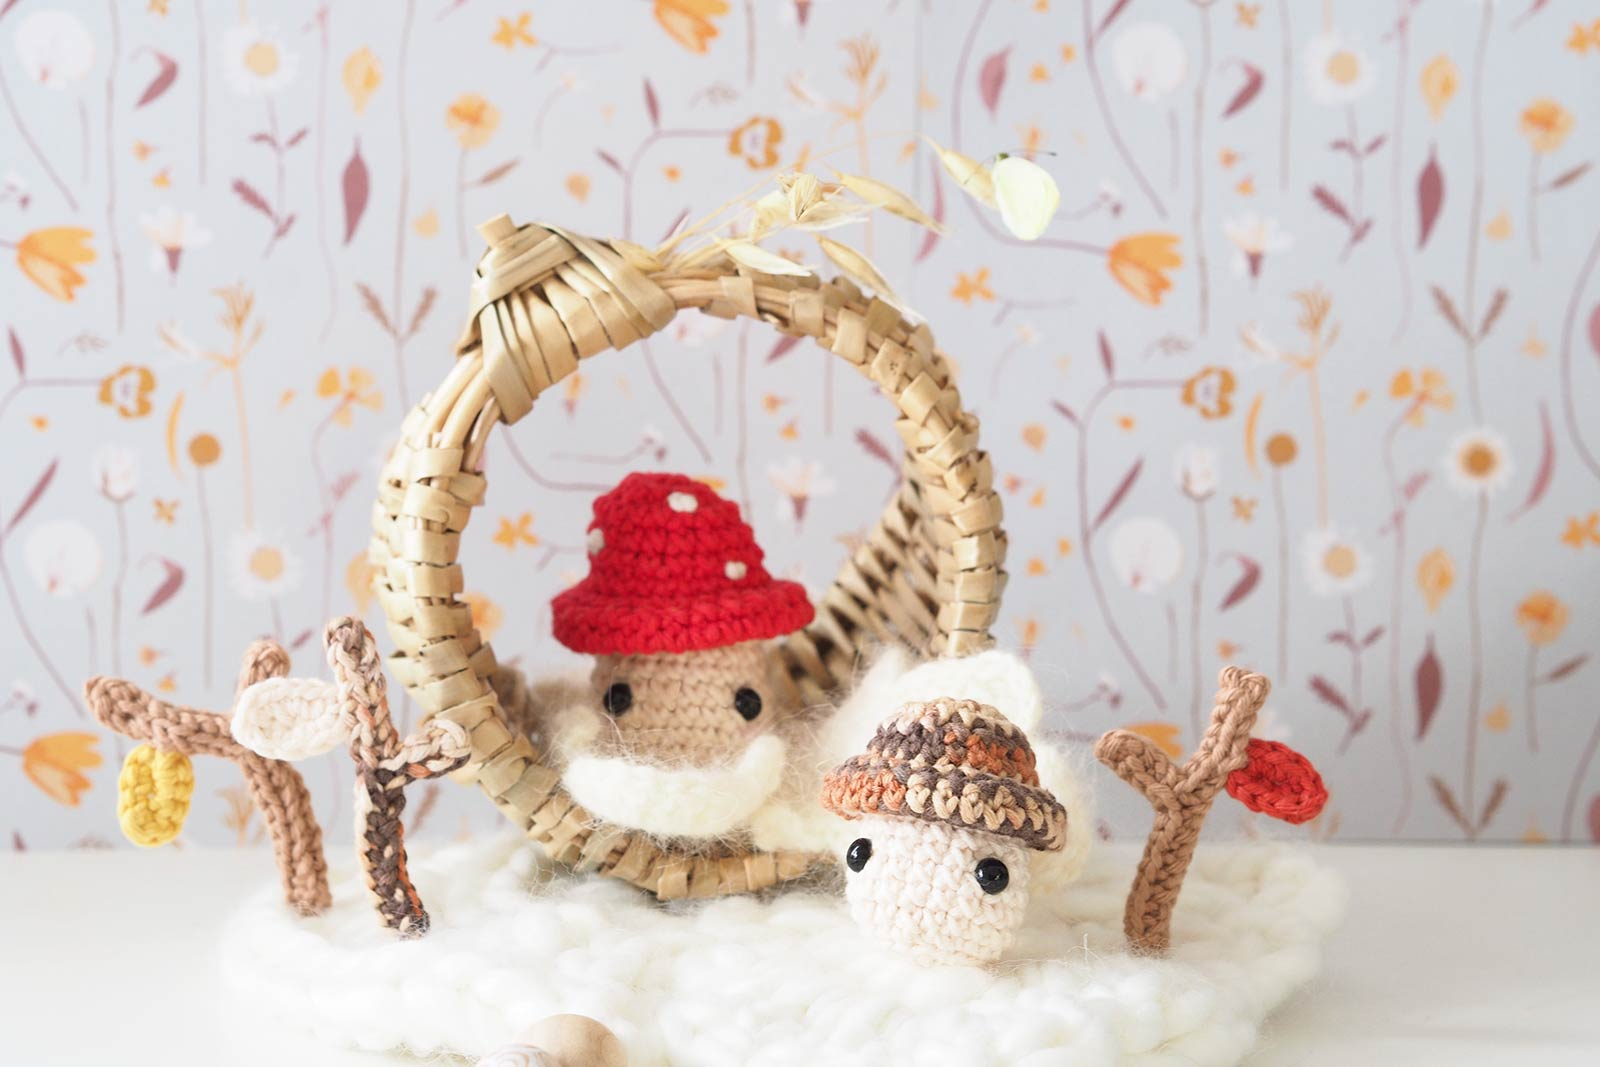 crochet-amigurumis-mushrooms-shinocrafts-laboutiquedemelimelo